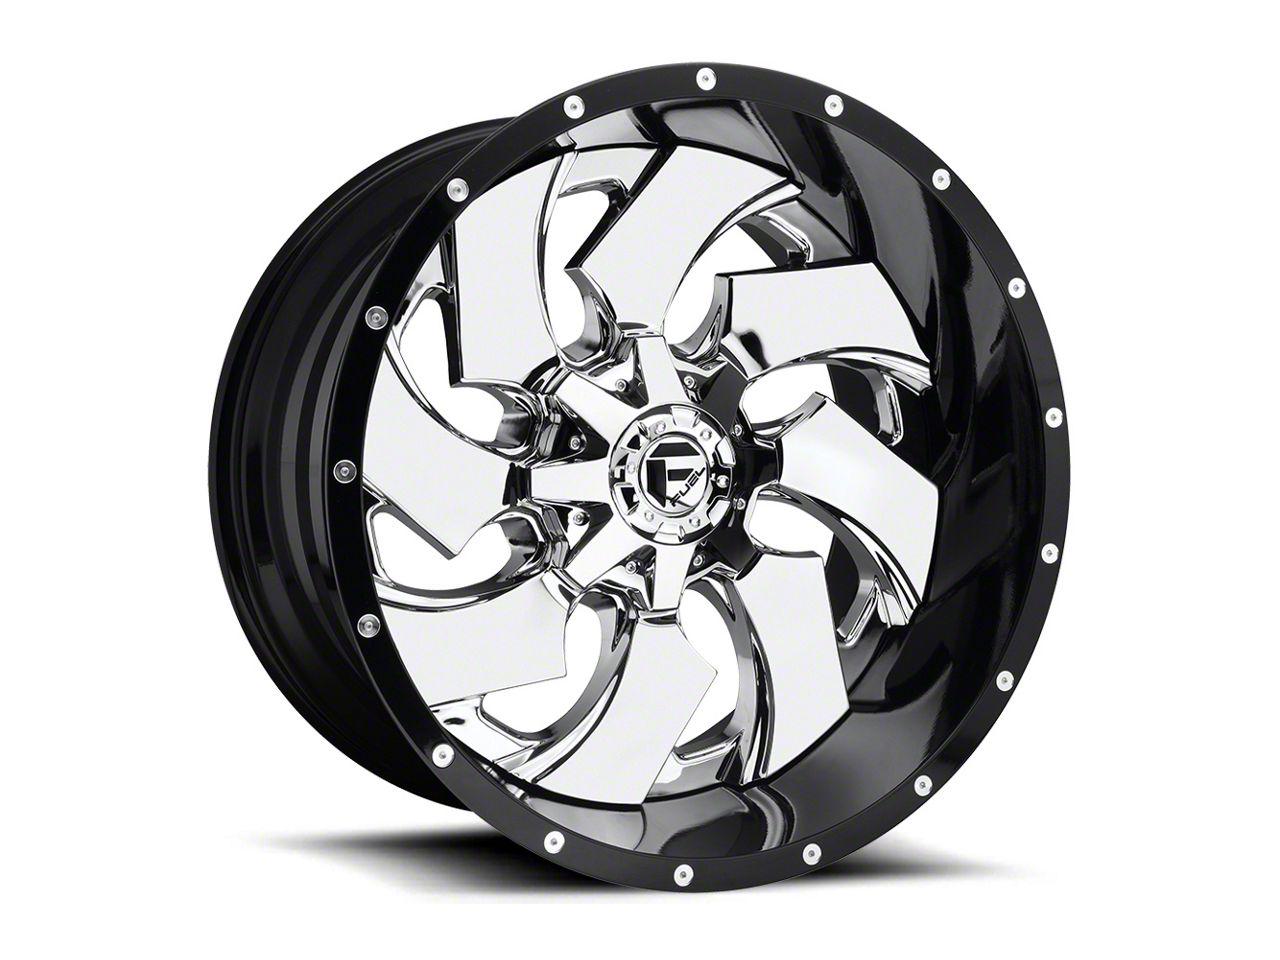 Fuel Wheels Cleaver Chrome 6-Lug Wheel - 24x12 (04-18 F-150)